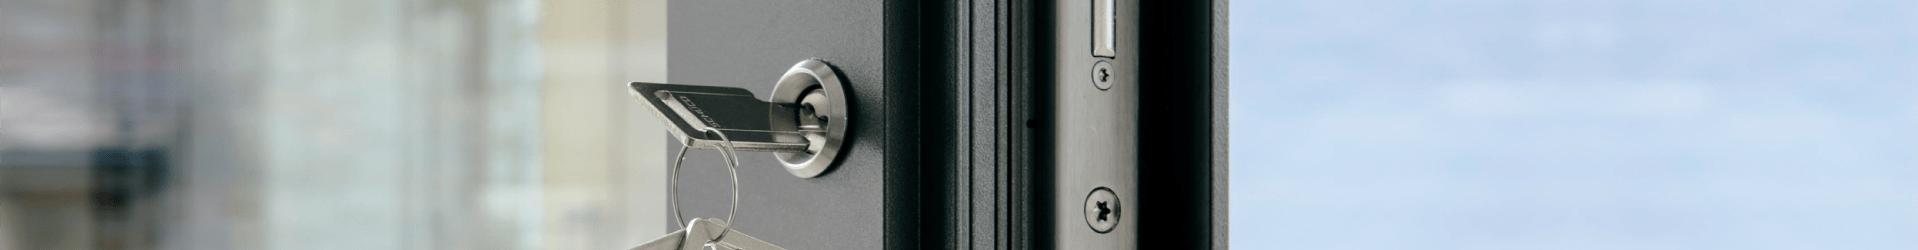 Security: opening control via gates Sonoff  RF  Bridge  e  Appthe HomeKits (via Homebridge)